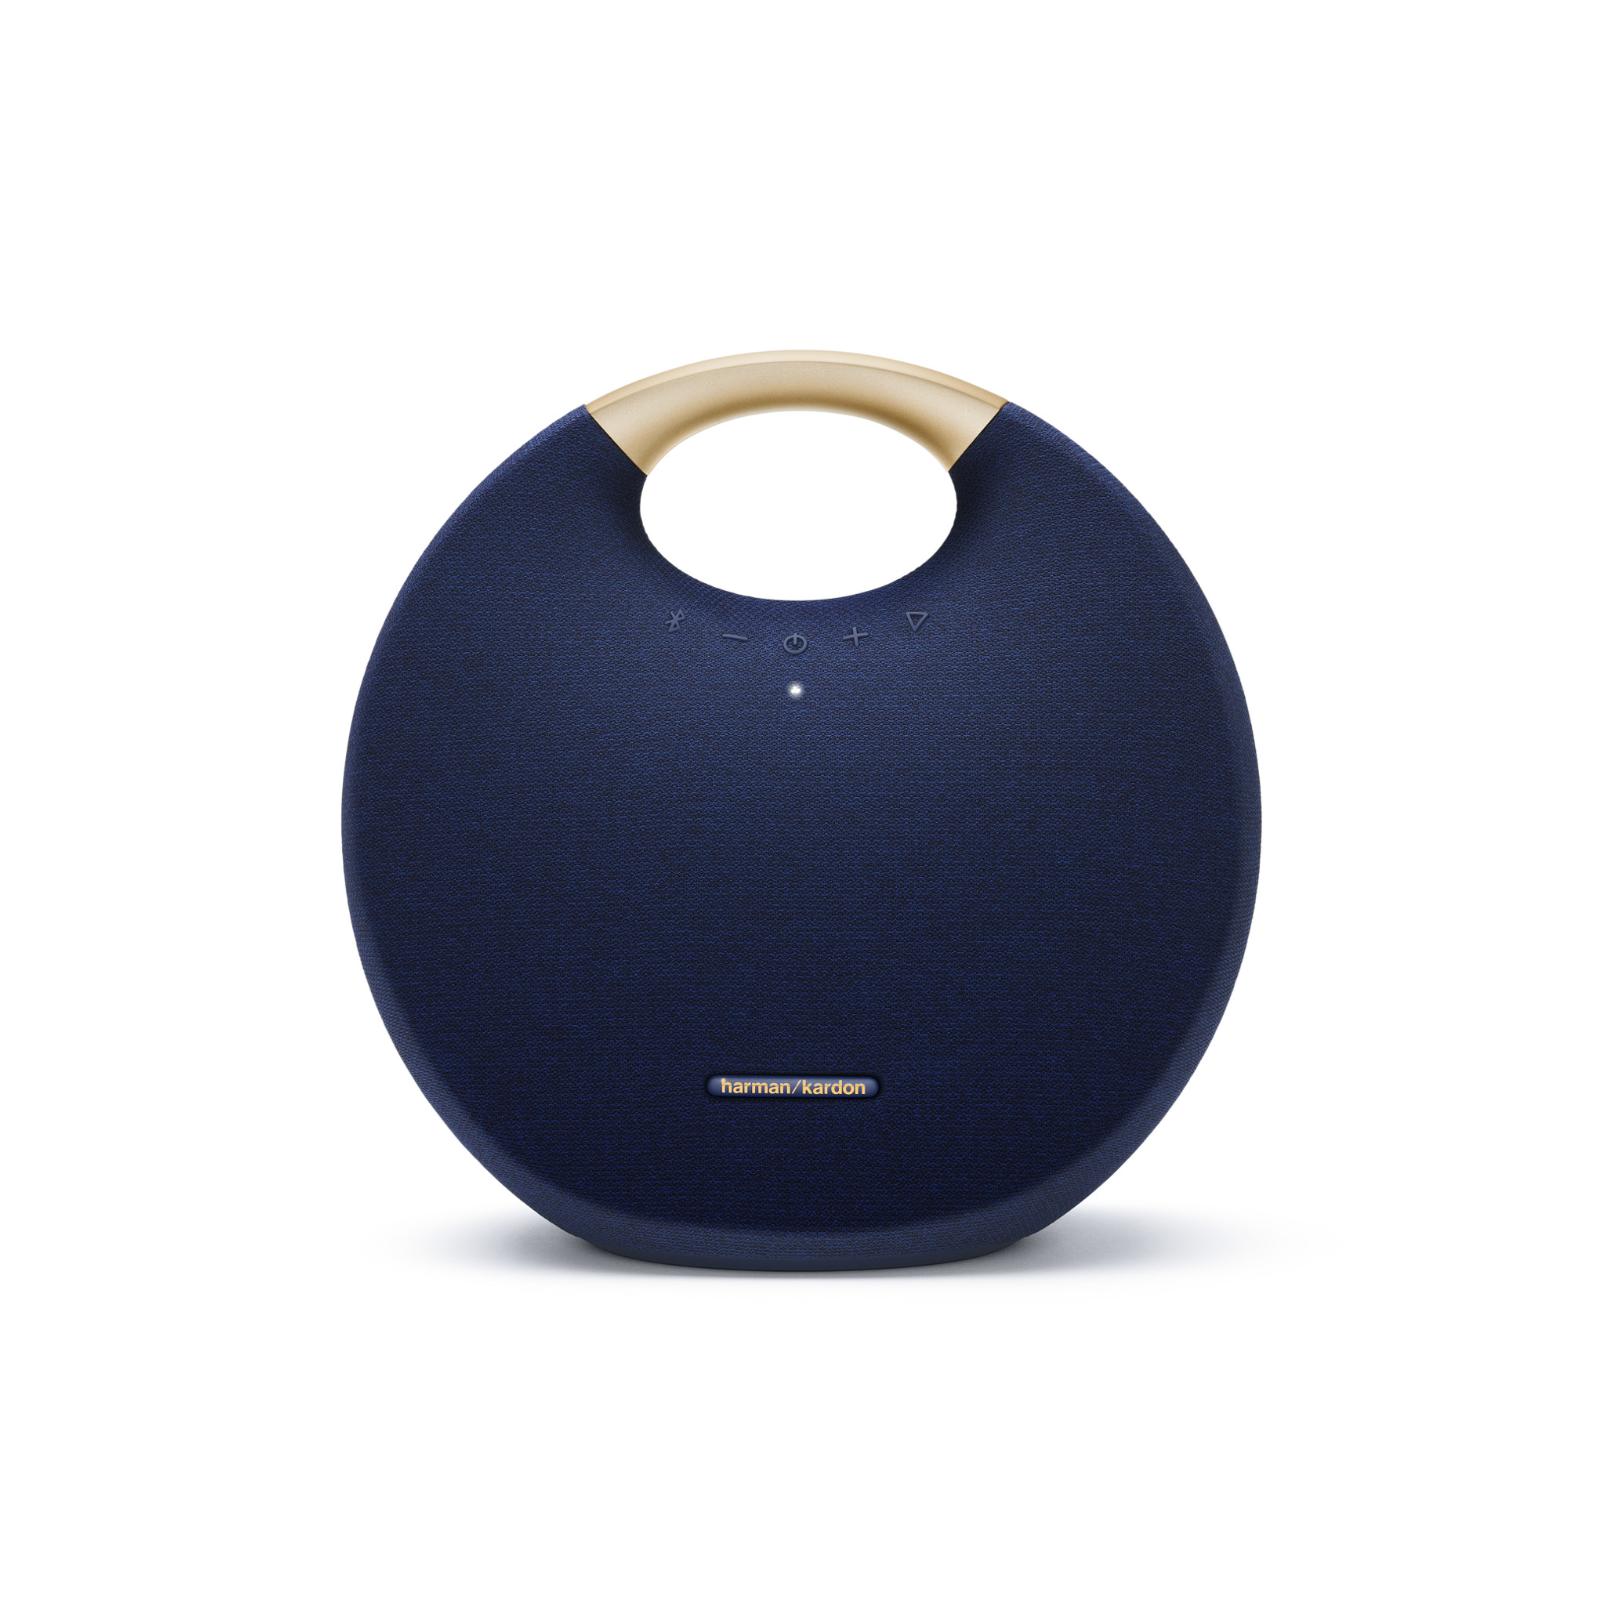 Onyx Studio 6 - Blue - Portable Bluetooth speaker - Hero